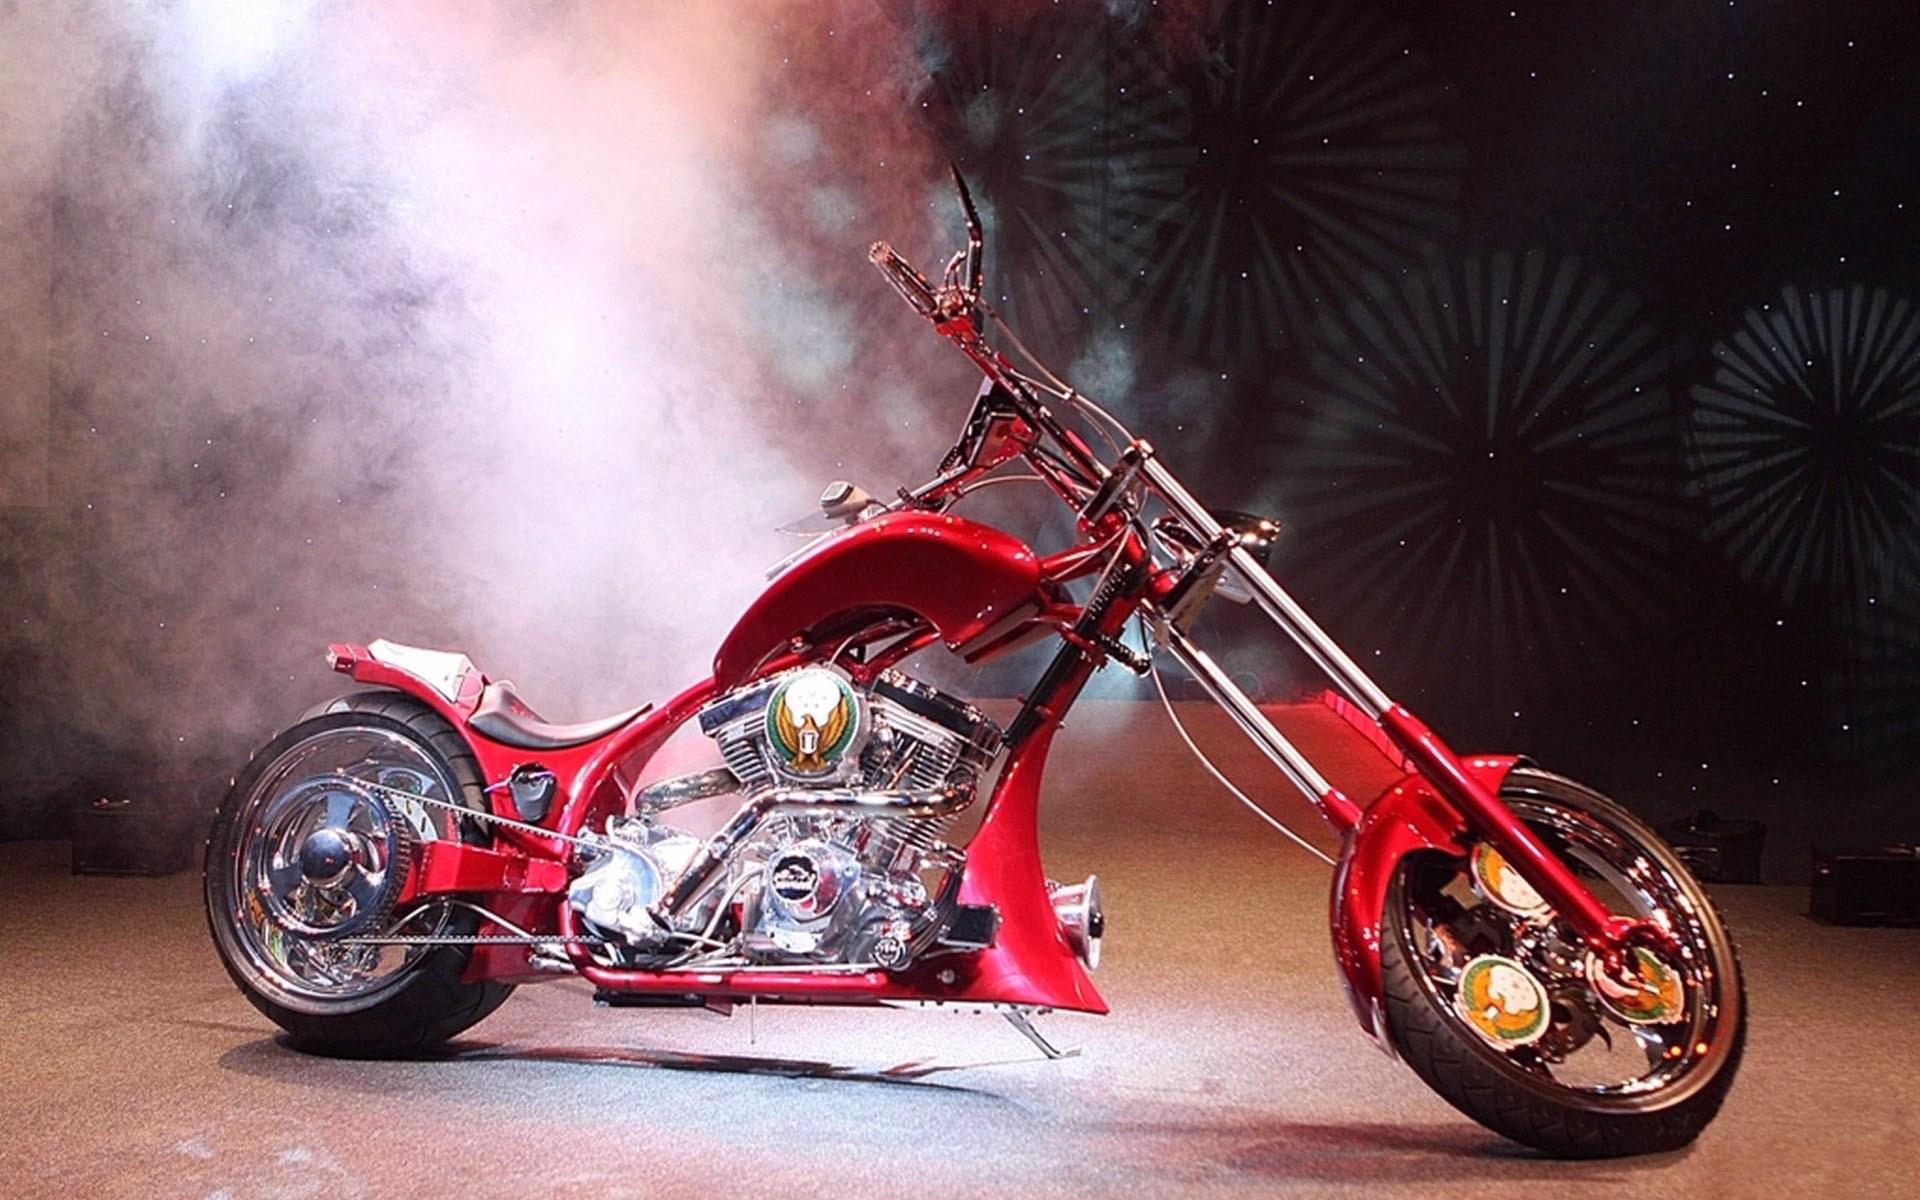 Chopper Harley Davidson Bike Wallpapers Daily Pics Update HD 1920x1200